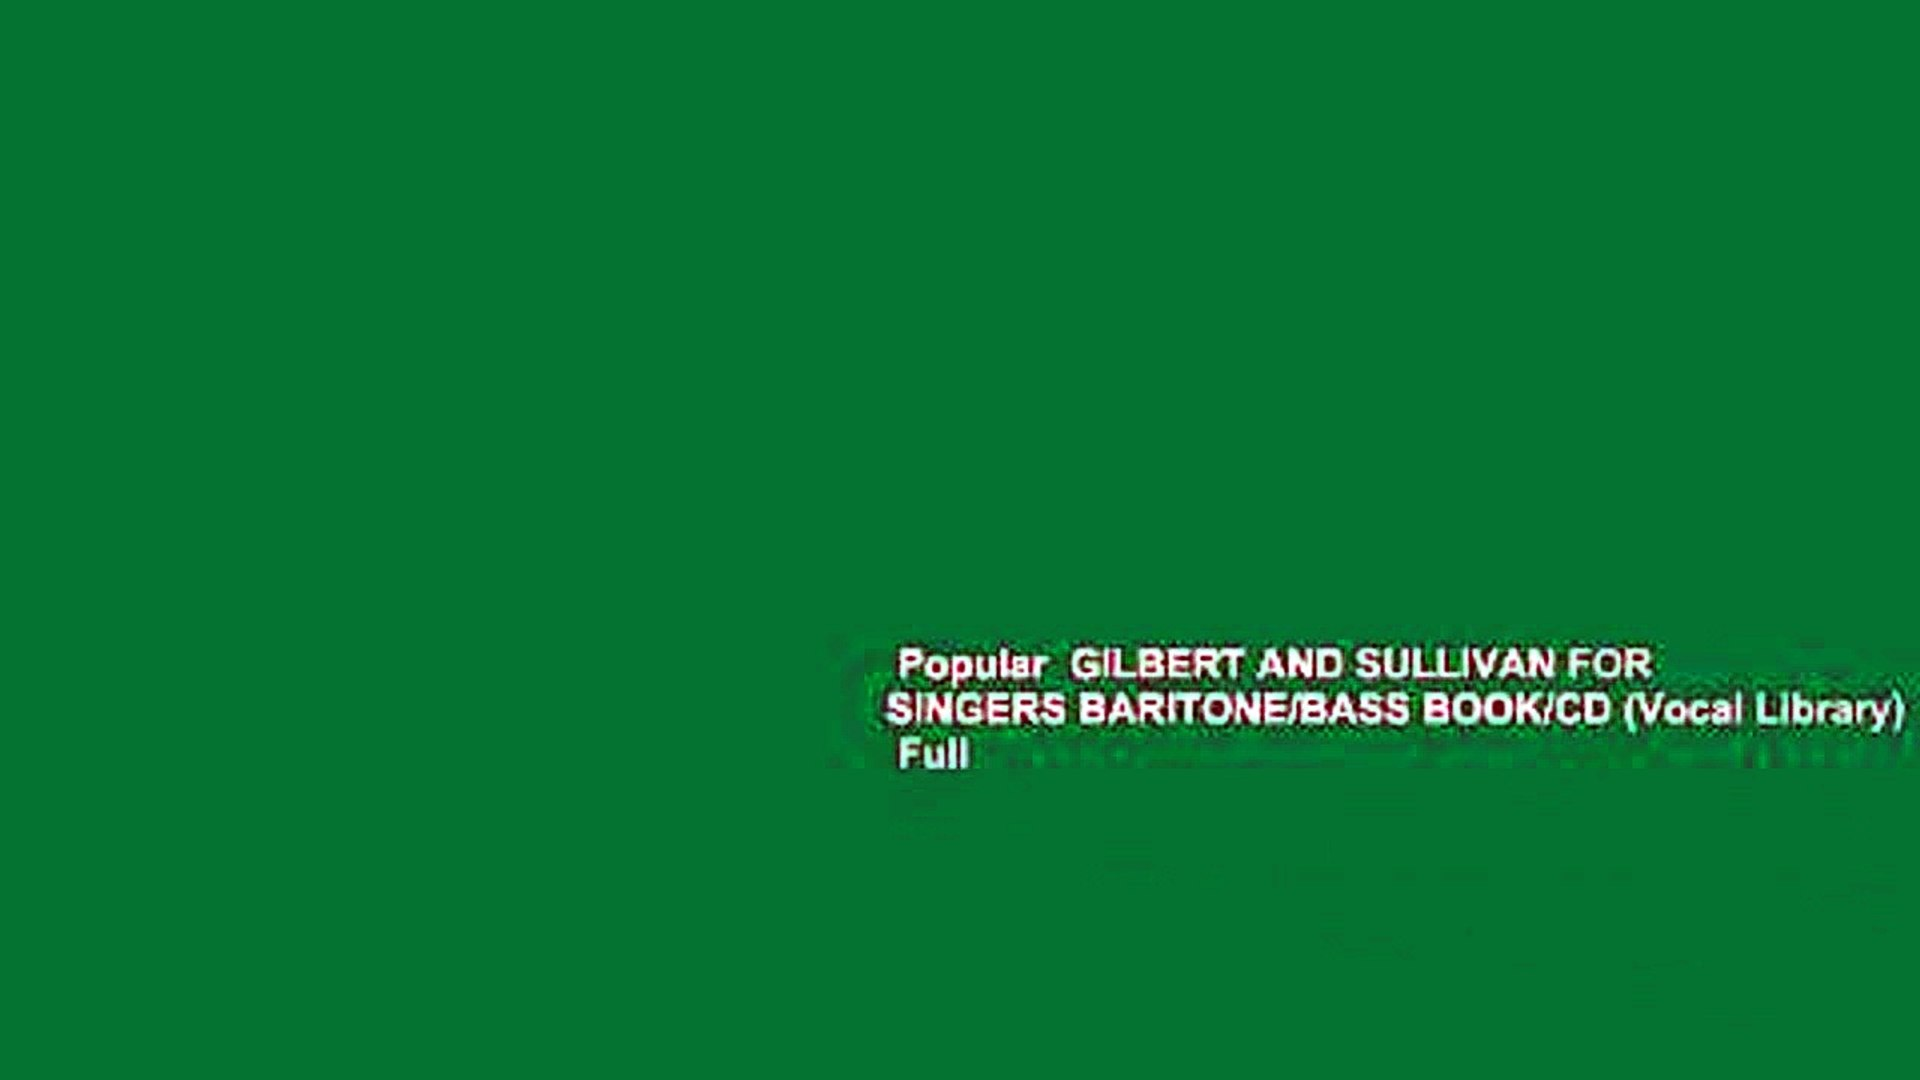 Popular GILBERT AND SULLIVAN FOR SINGERS BARITONE/BASS BOOK